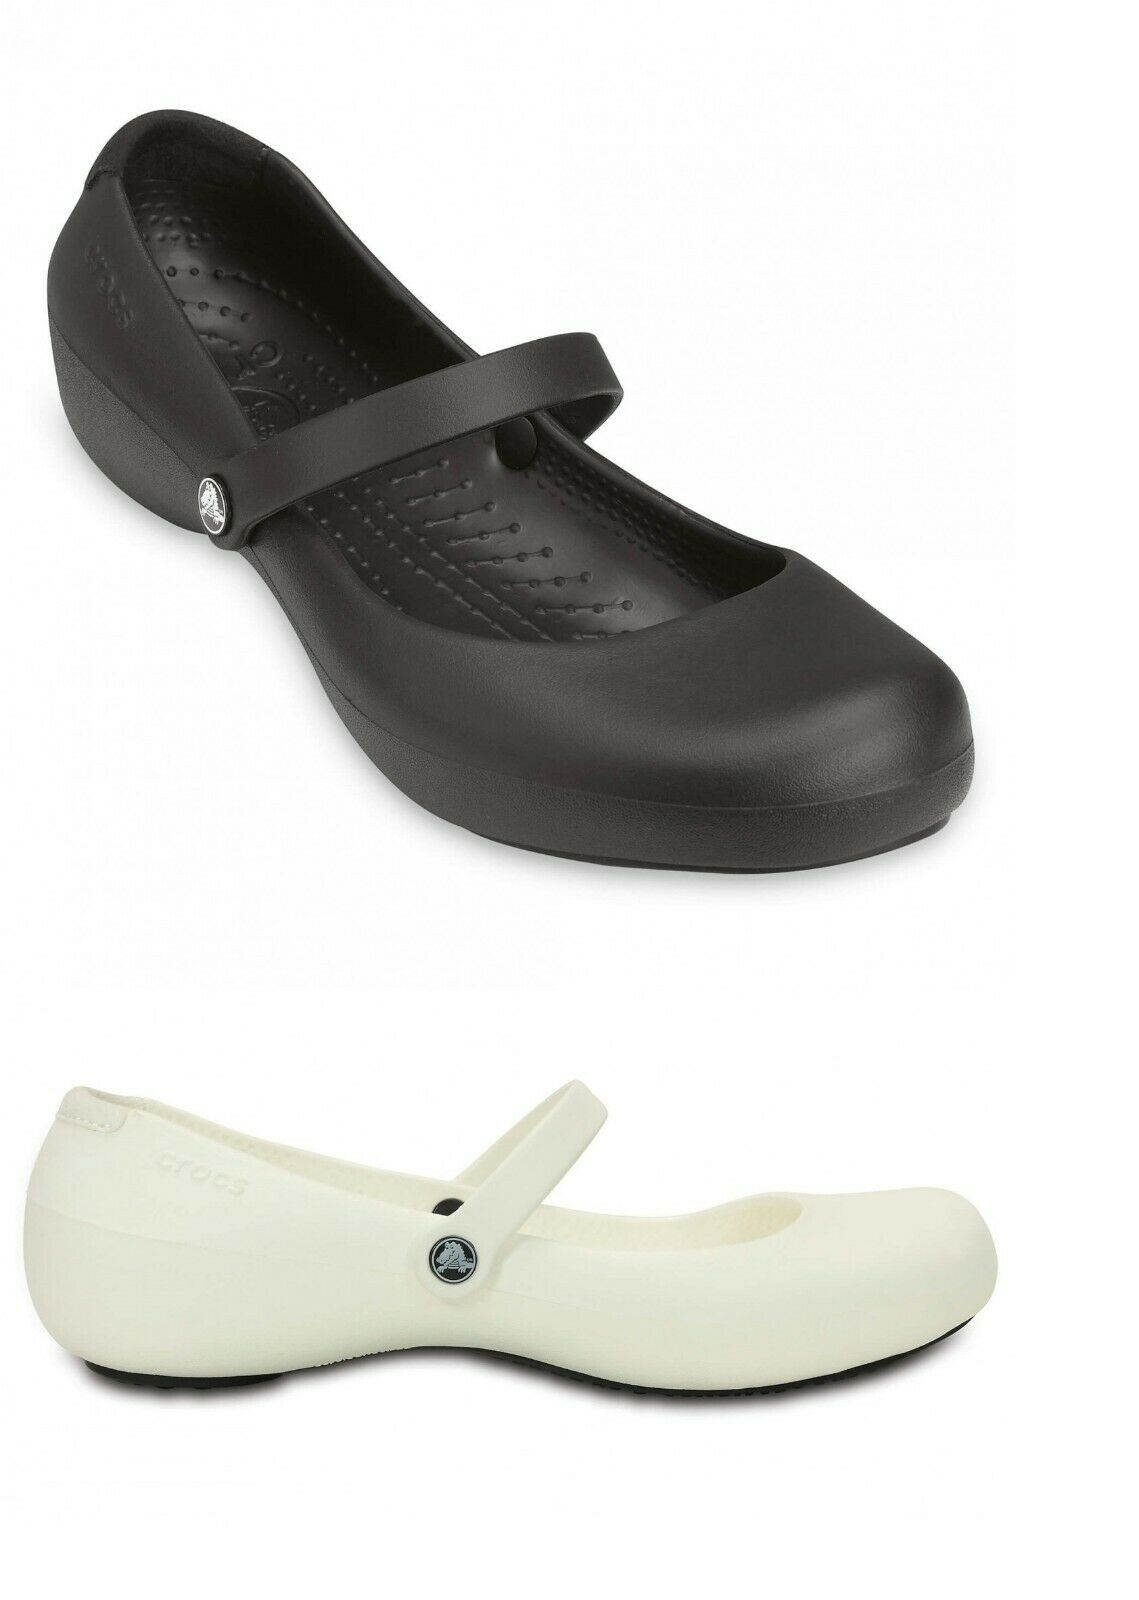 Alice Crocs Womens Alice  Croslite Slip Resistance Mary Jane Work Shoes